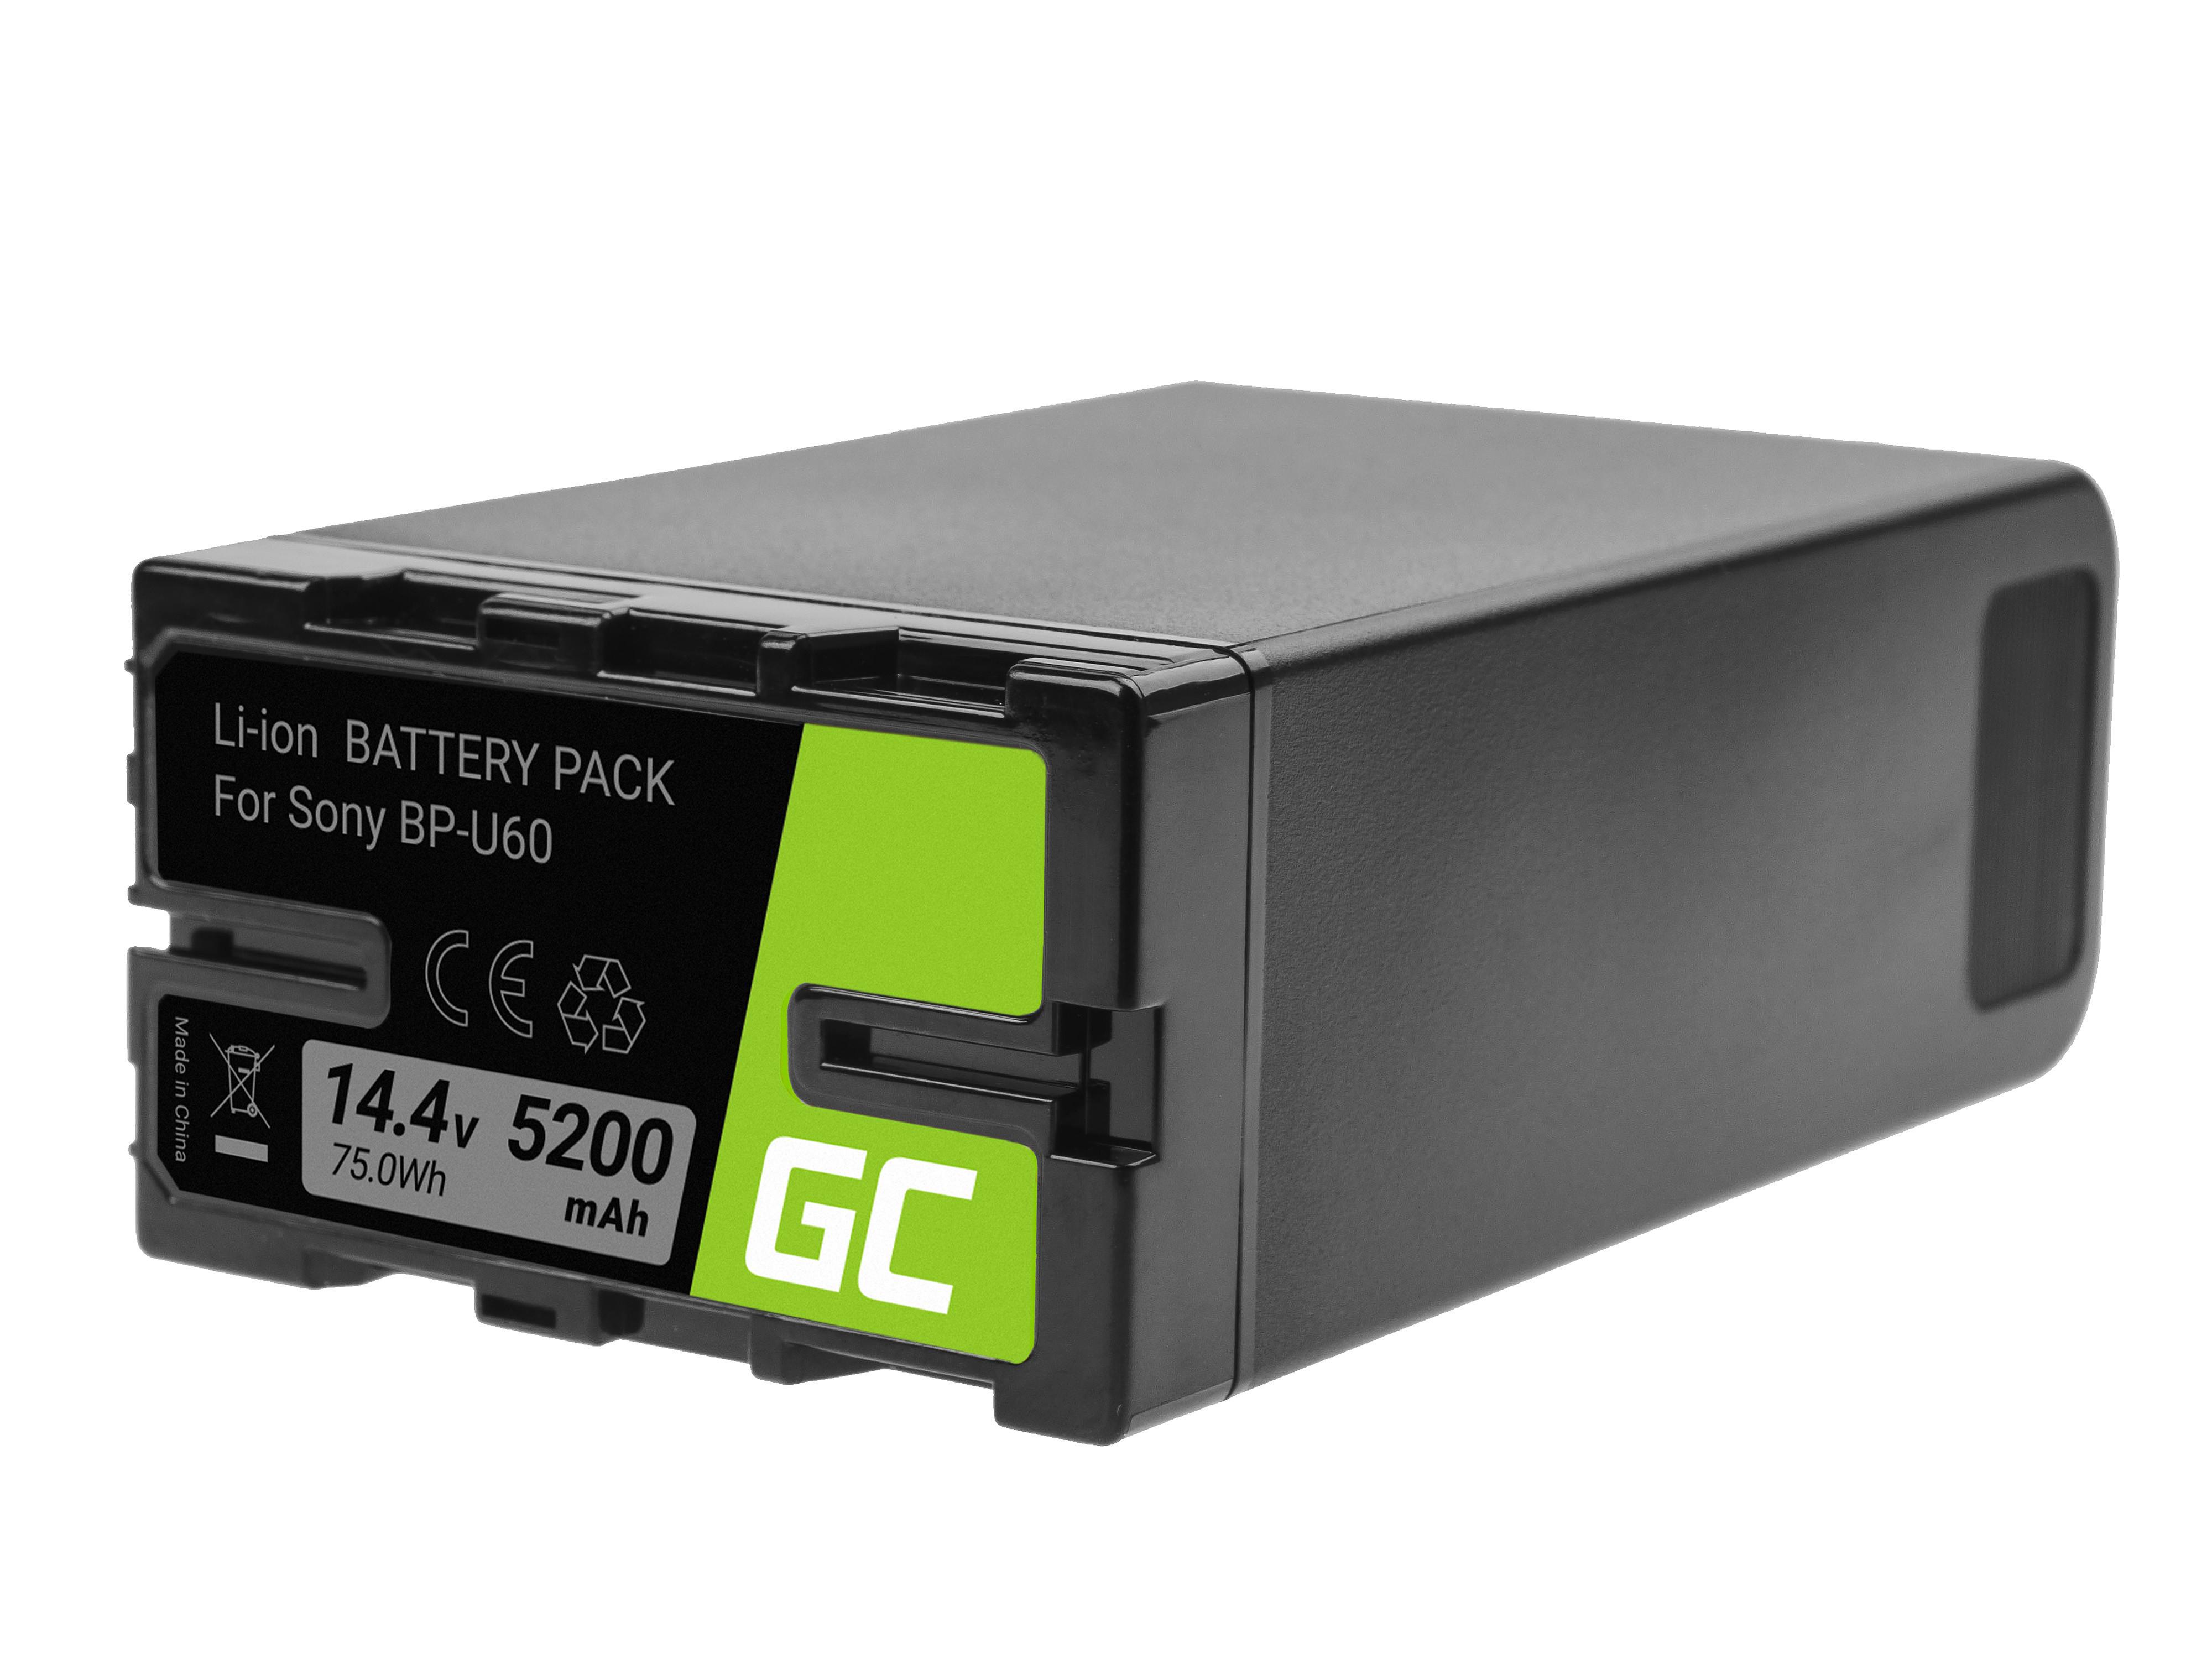 Batteri BP-U90 BP-U60 BP-U30 för Sony 5200mAh 75Wh 14.4V